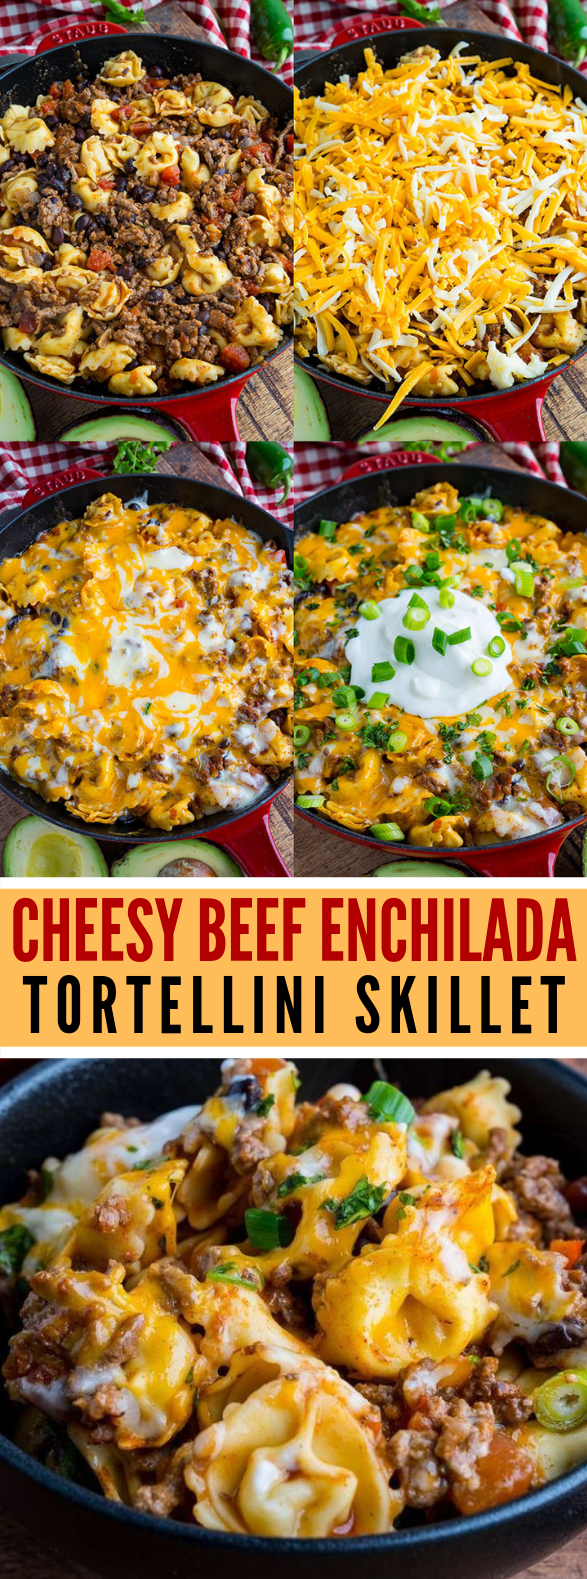 Cheesy Beef Enchilada Tortellini Skillet #dinner #cheese